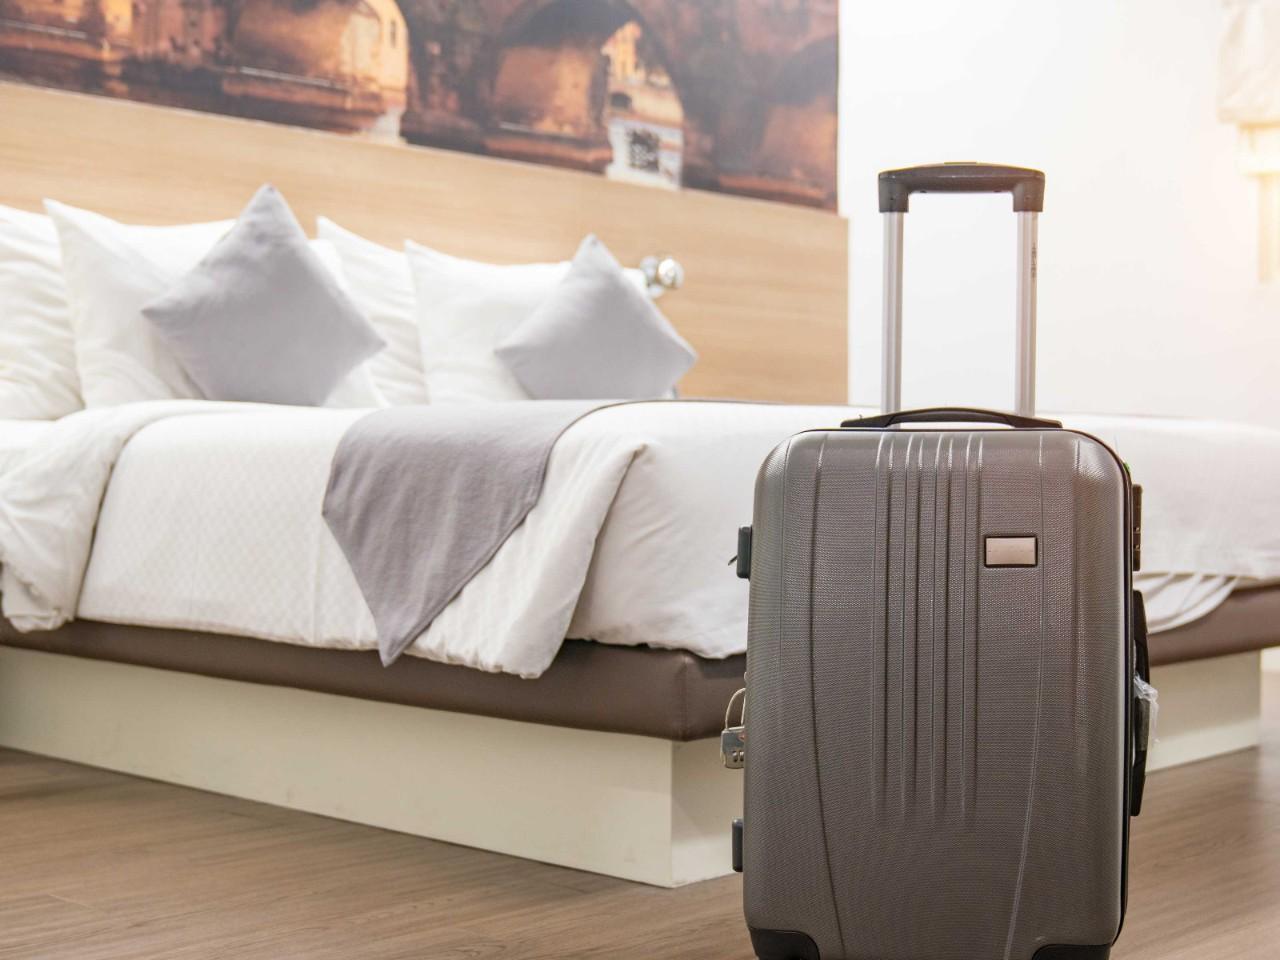 Luggage And Flight Luggage Sbb